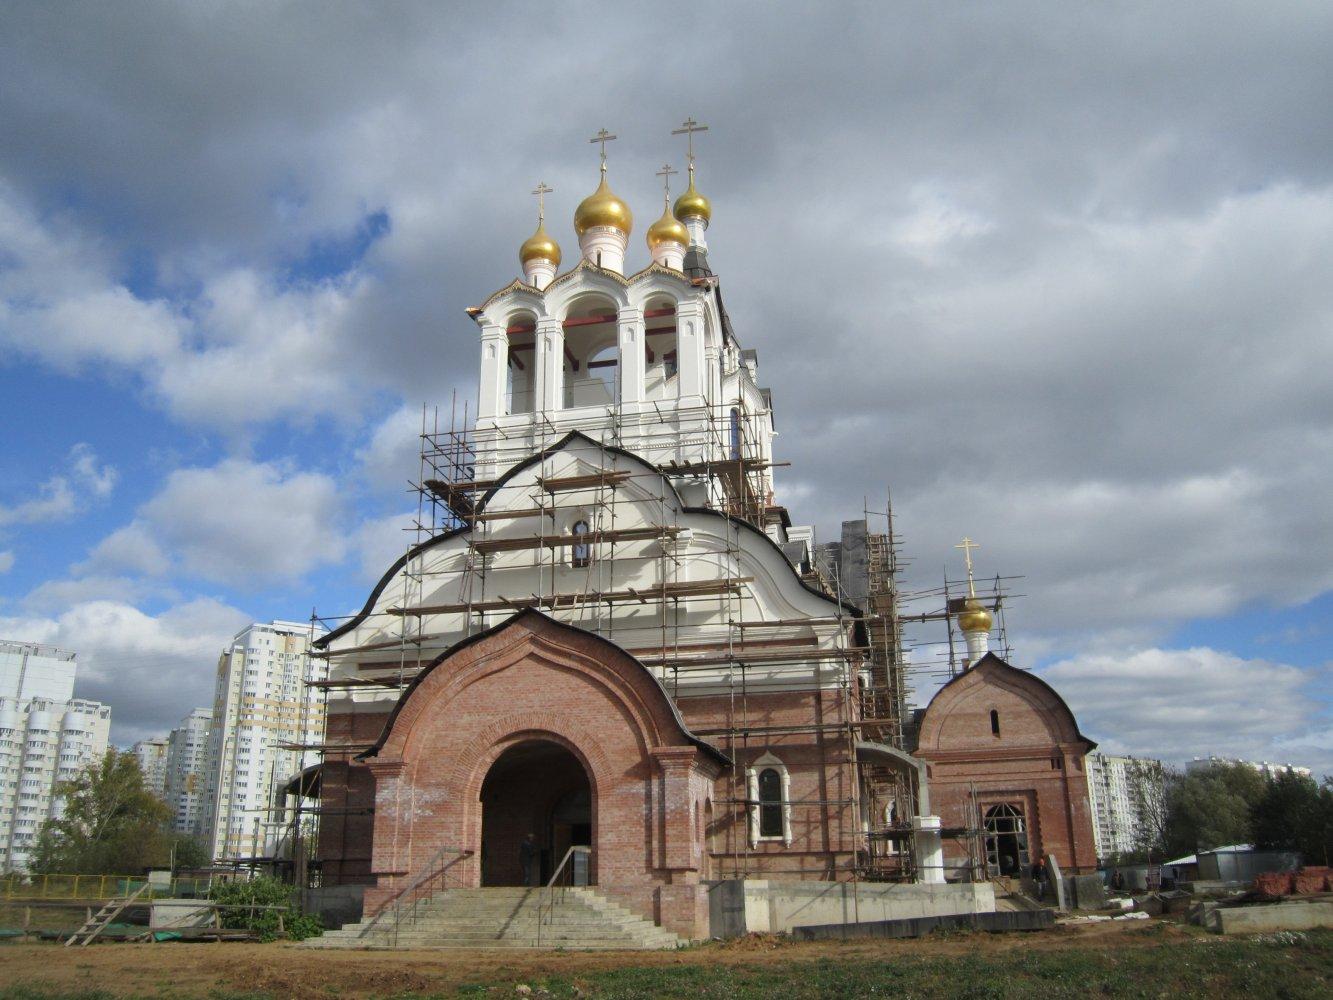 Фото IMG_9814.JPG. Россия, город Москва, улица Барышиха